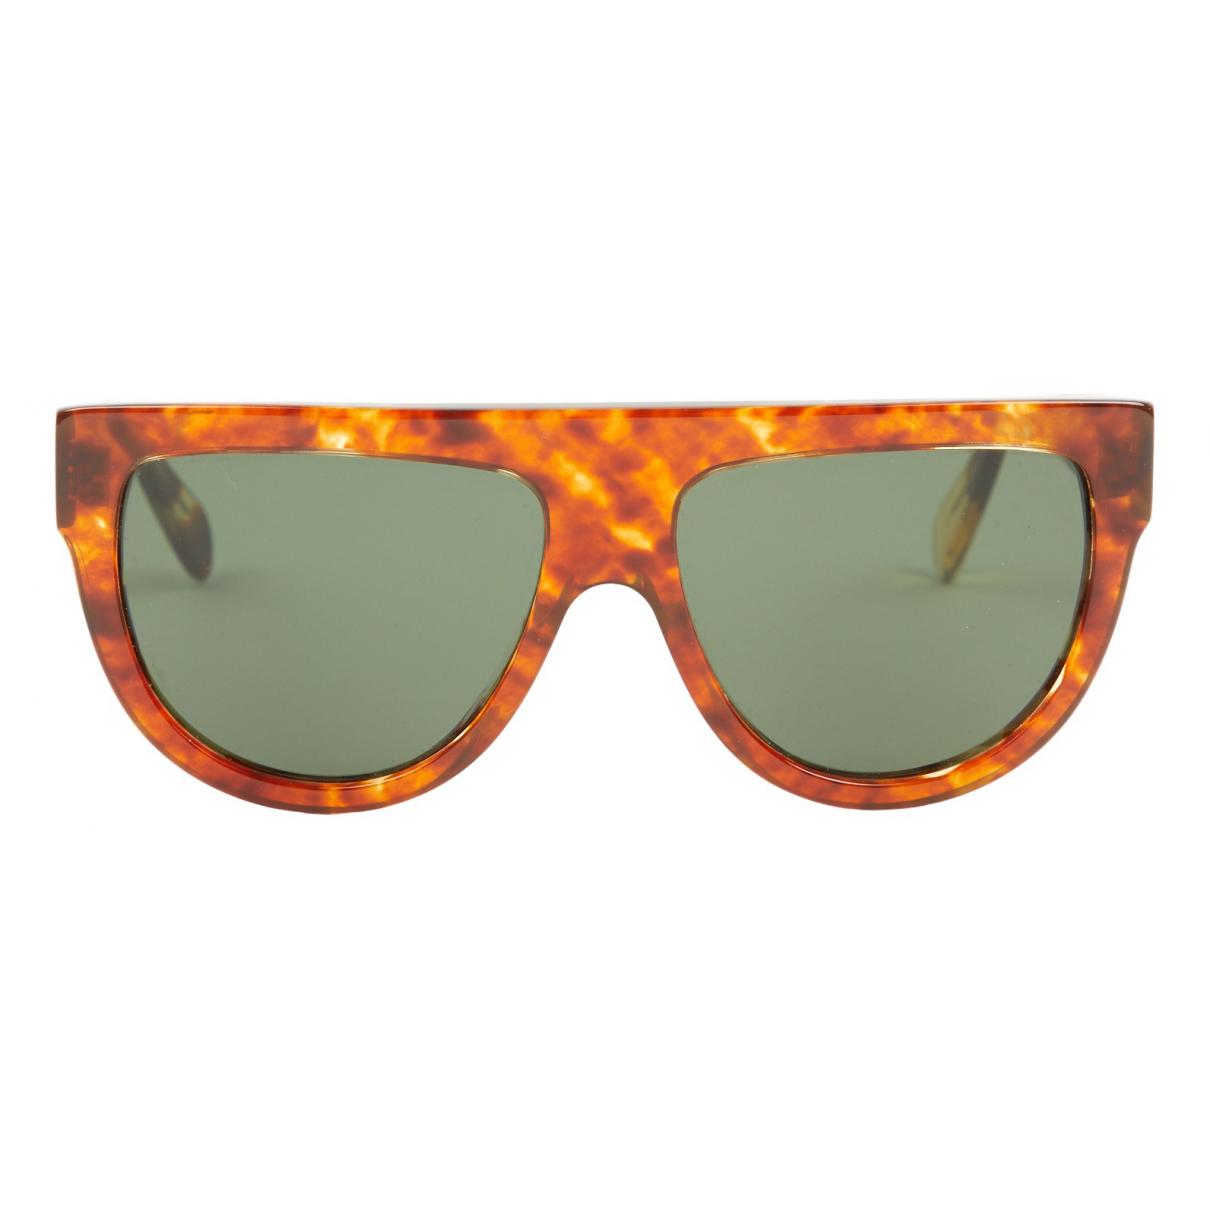 Celine Shadow Brown Sunglasses for Women N